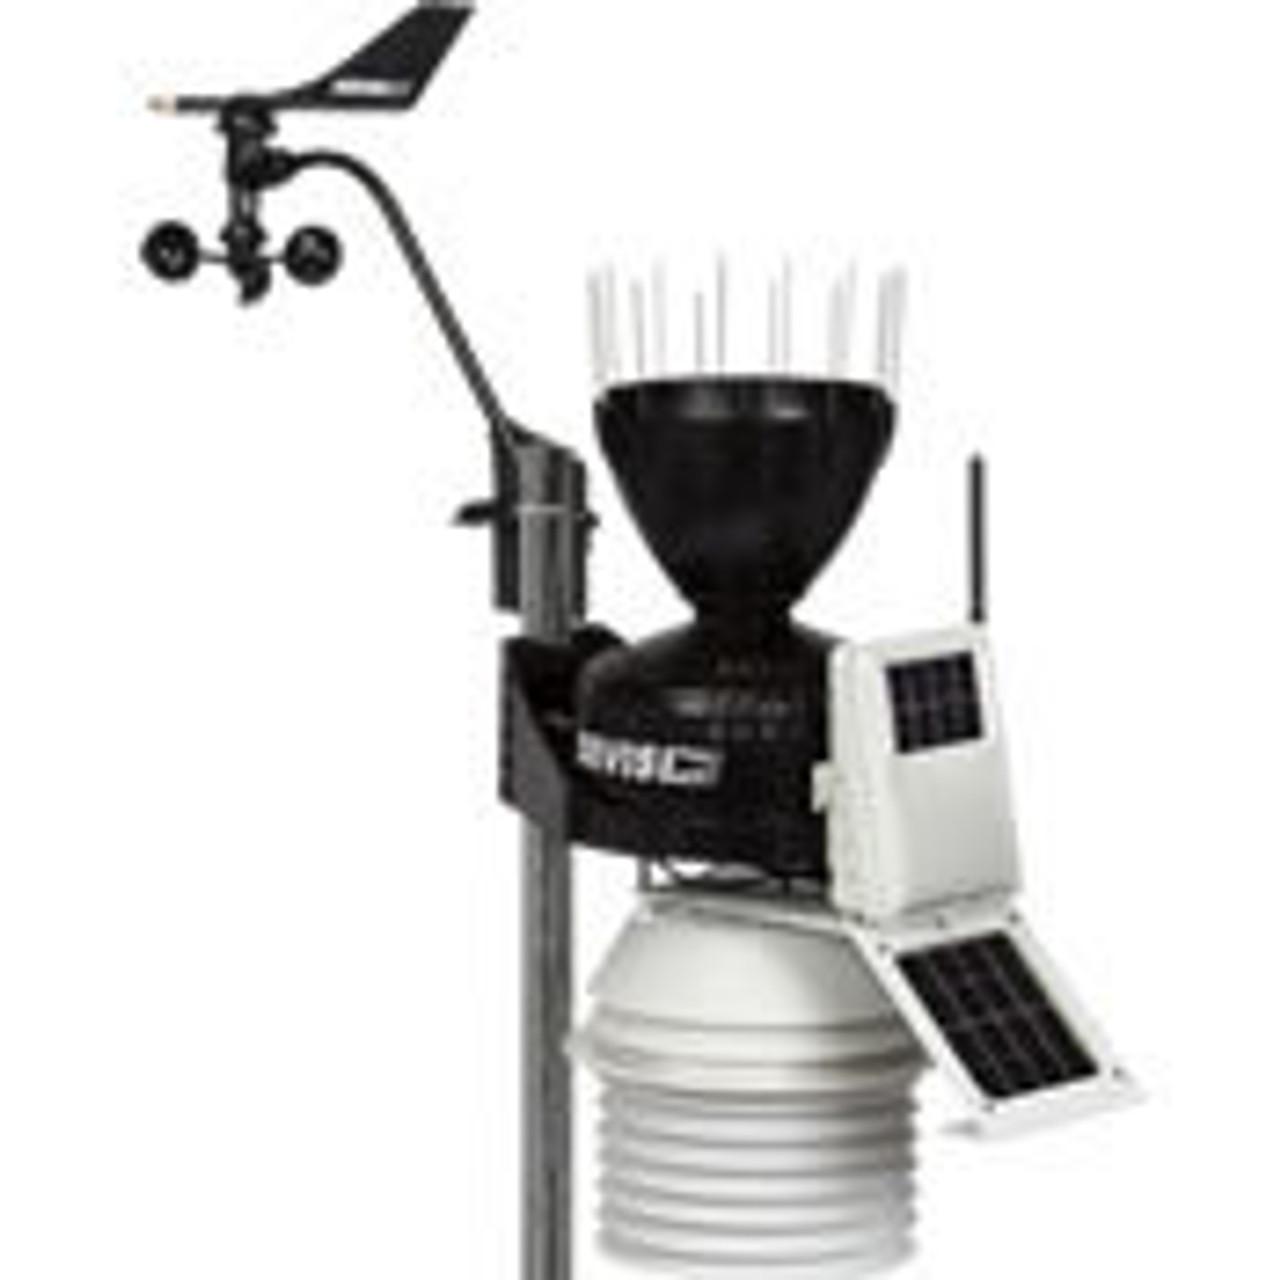 Davis Vantage Pro2 6323AU Integrated Sensor Suite with 24hr Fan-aspirated Radiation Shield